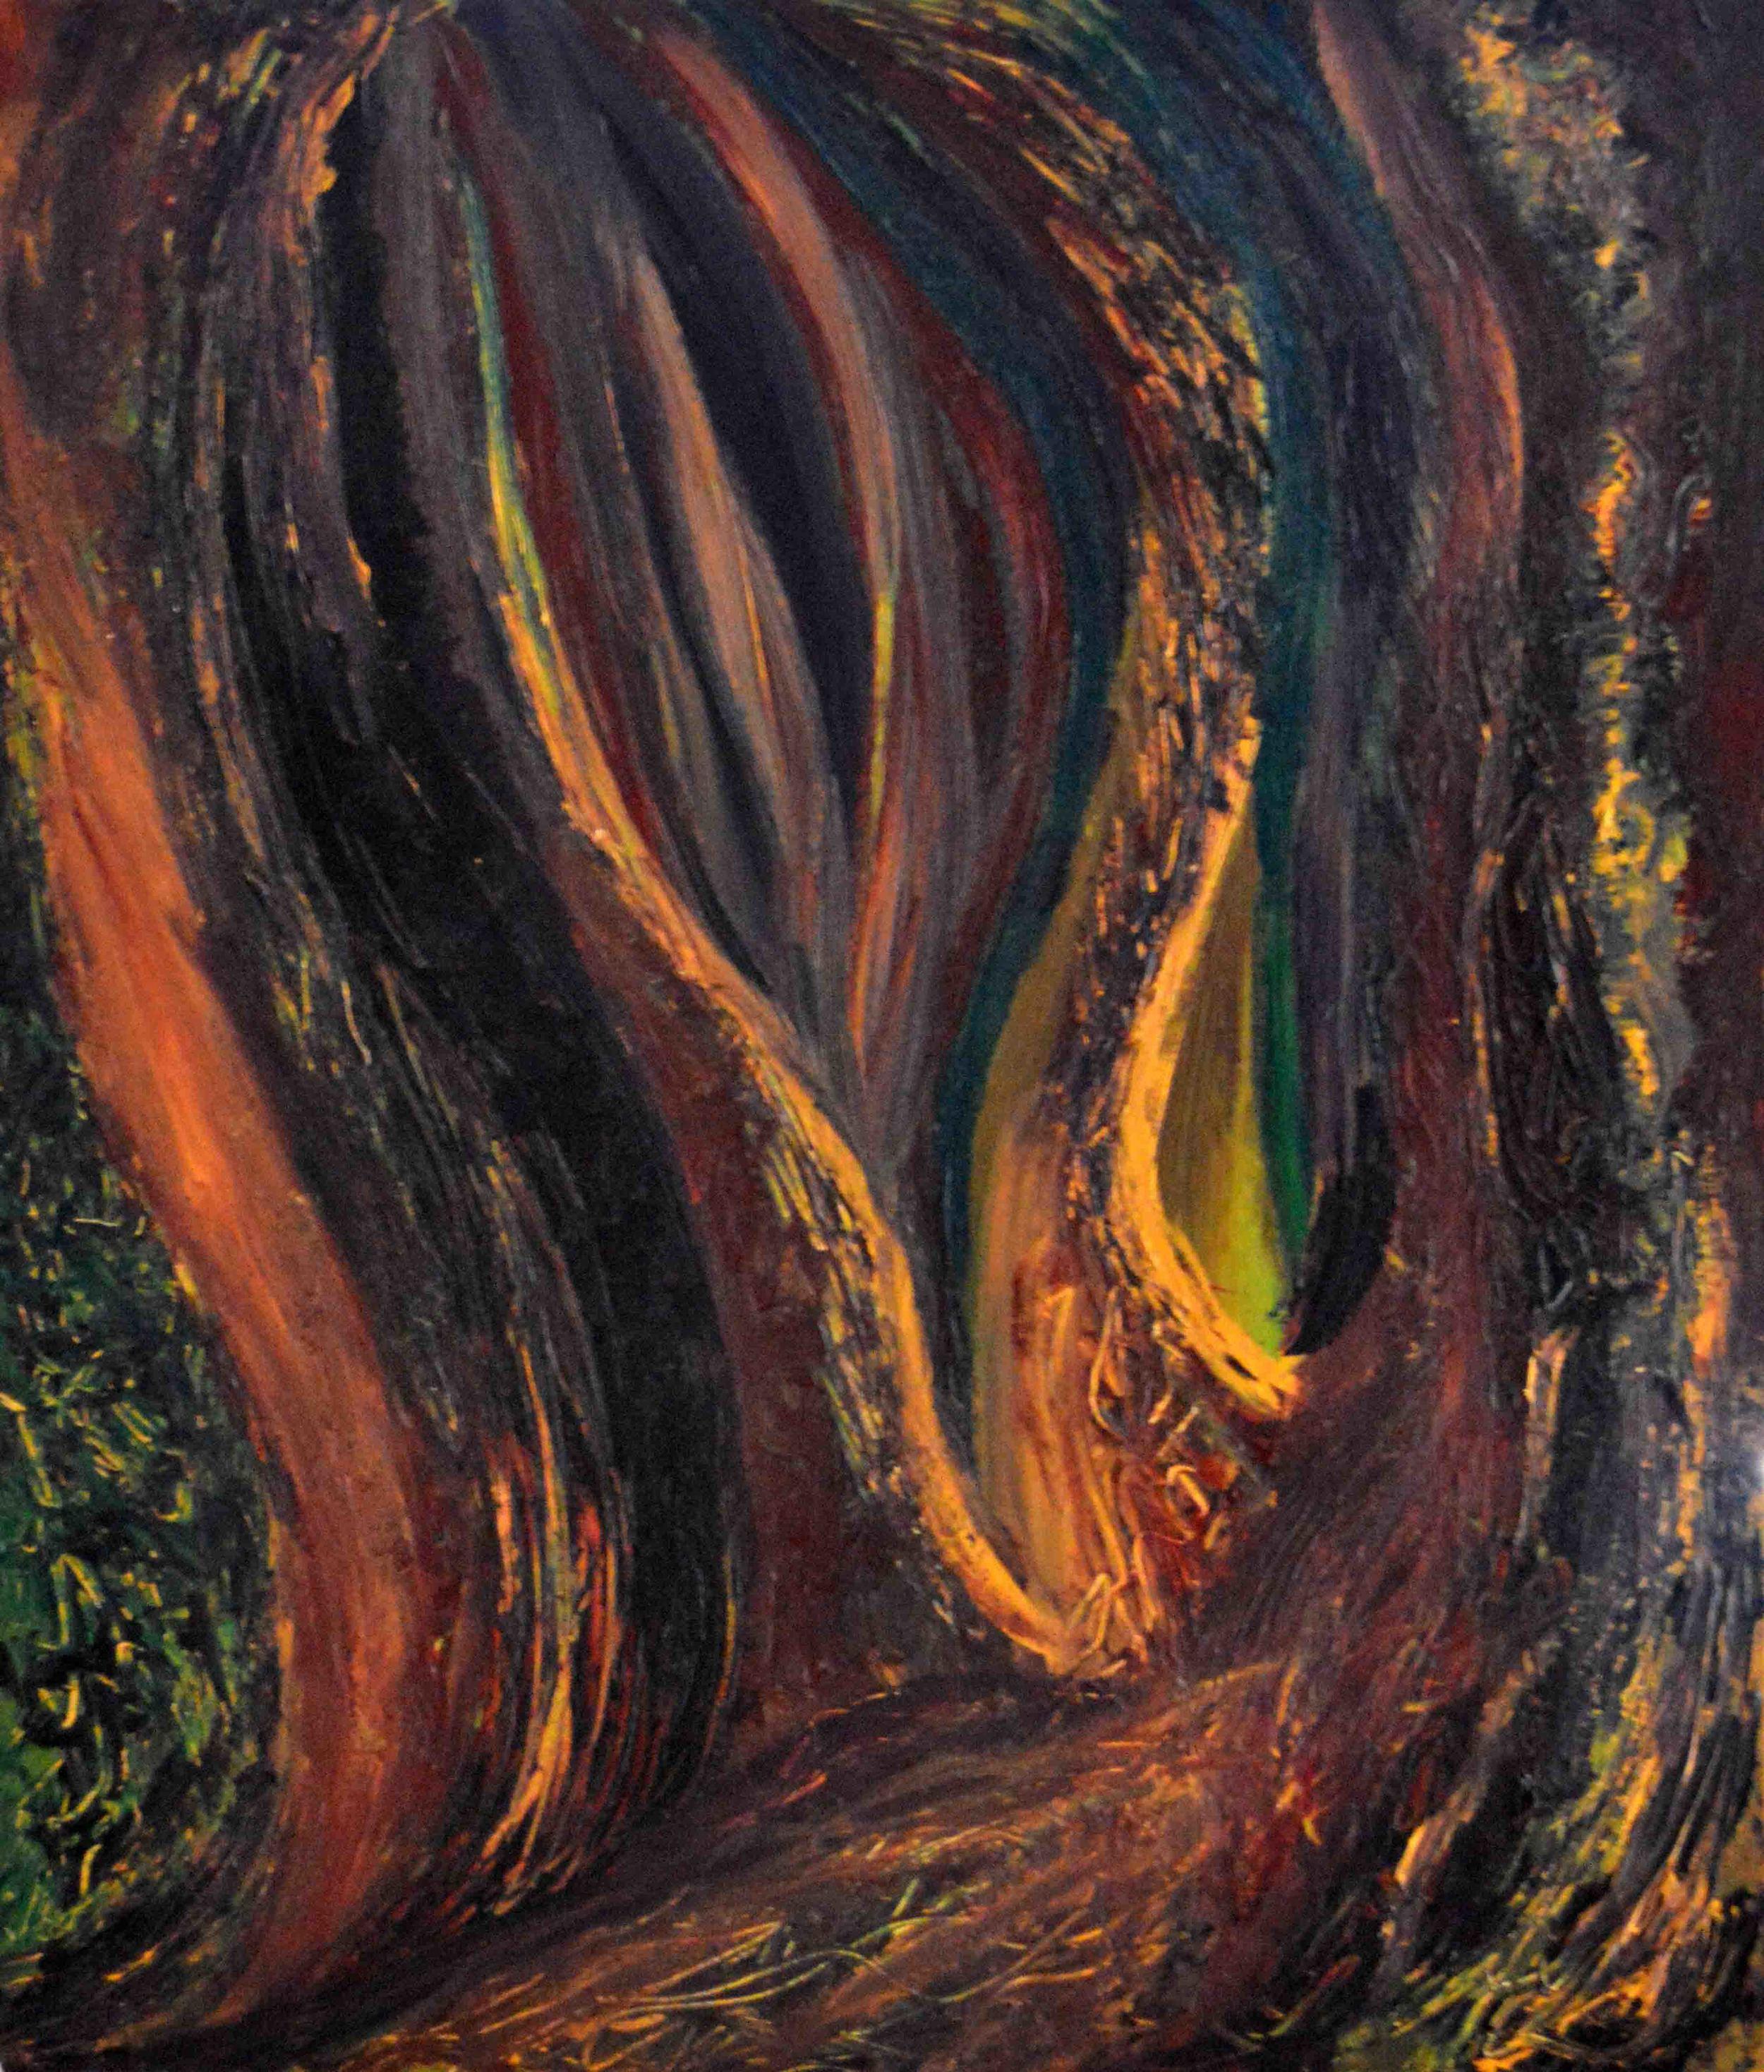 A Radiant Heart Light     , 2007, Acrylic, 24.75 x 29.0625 in